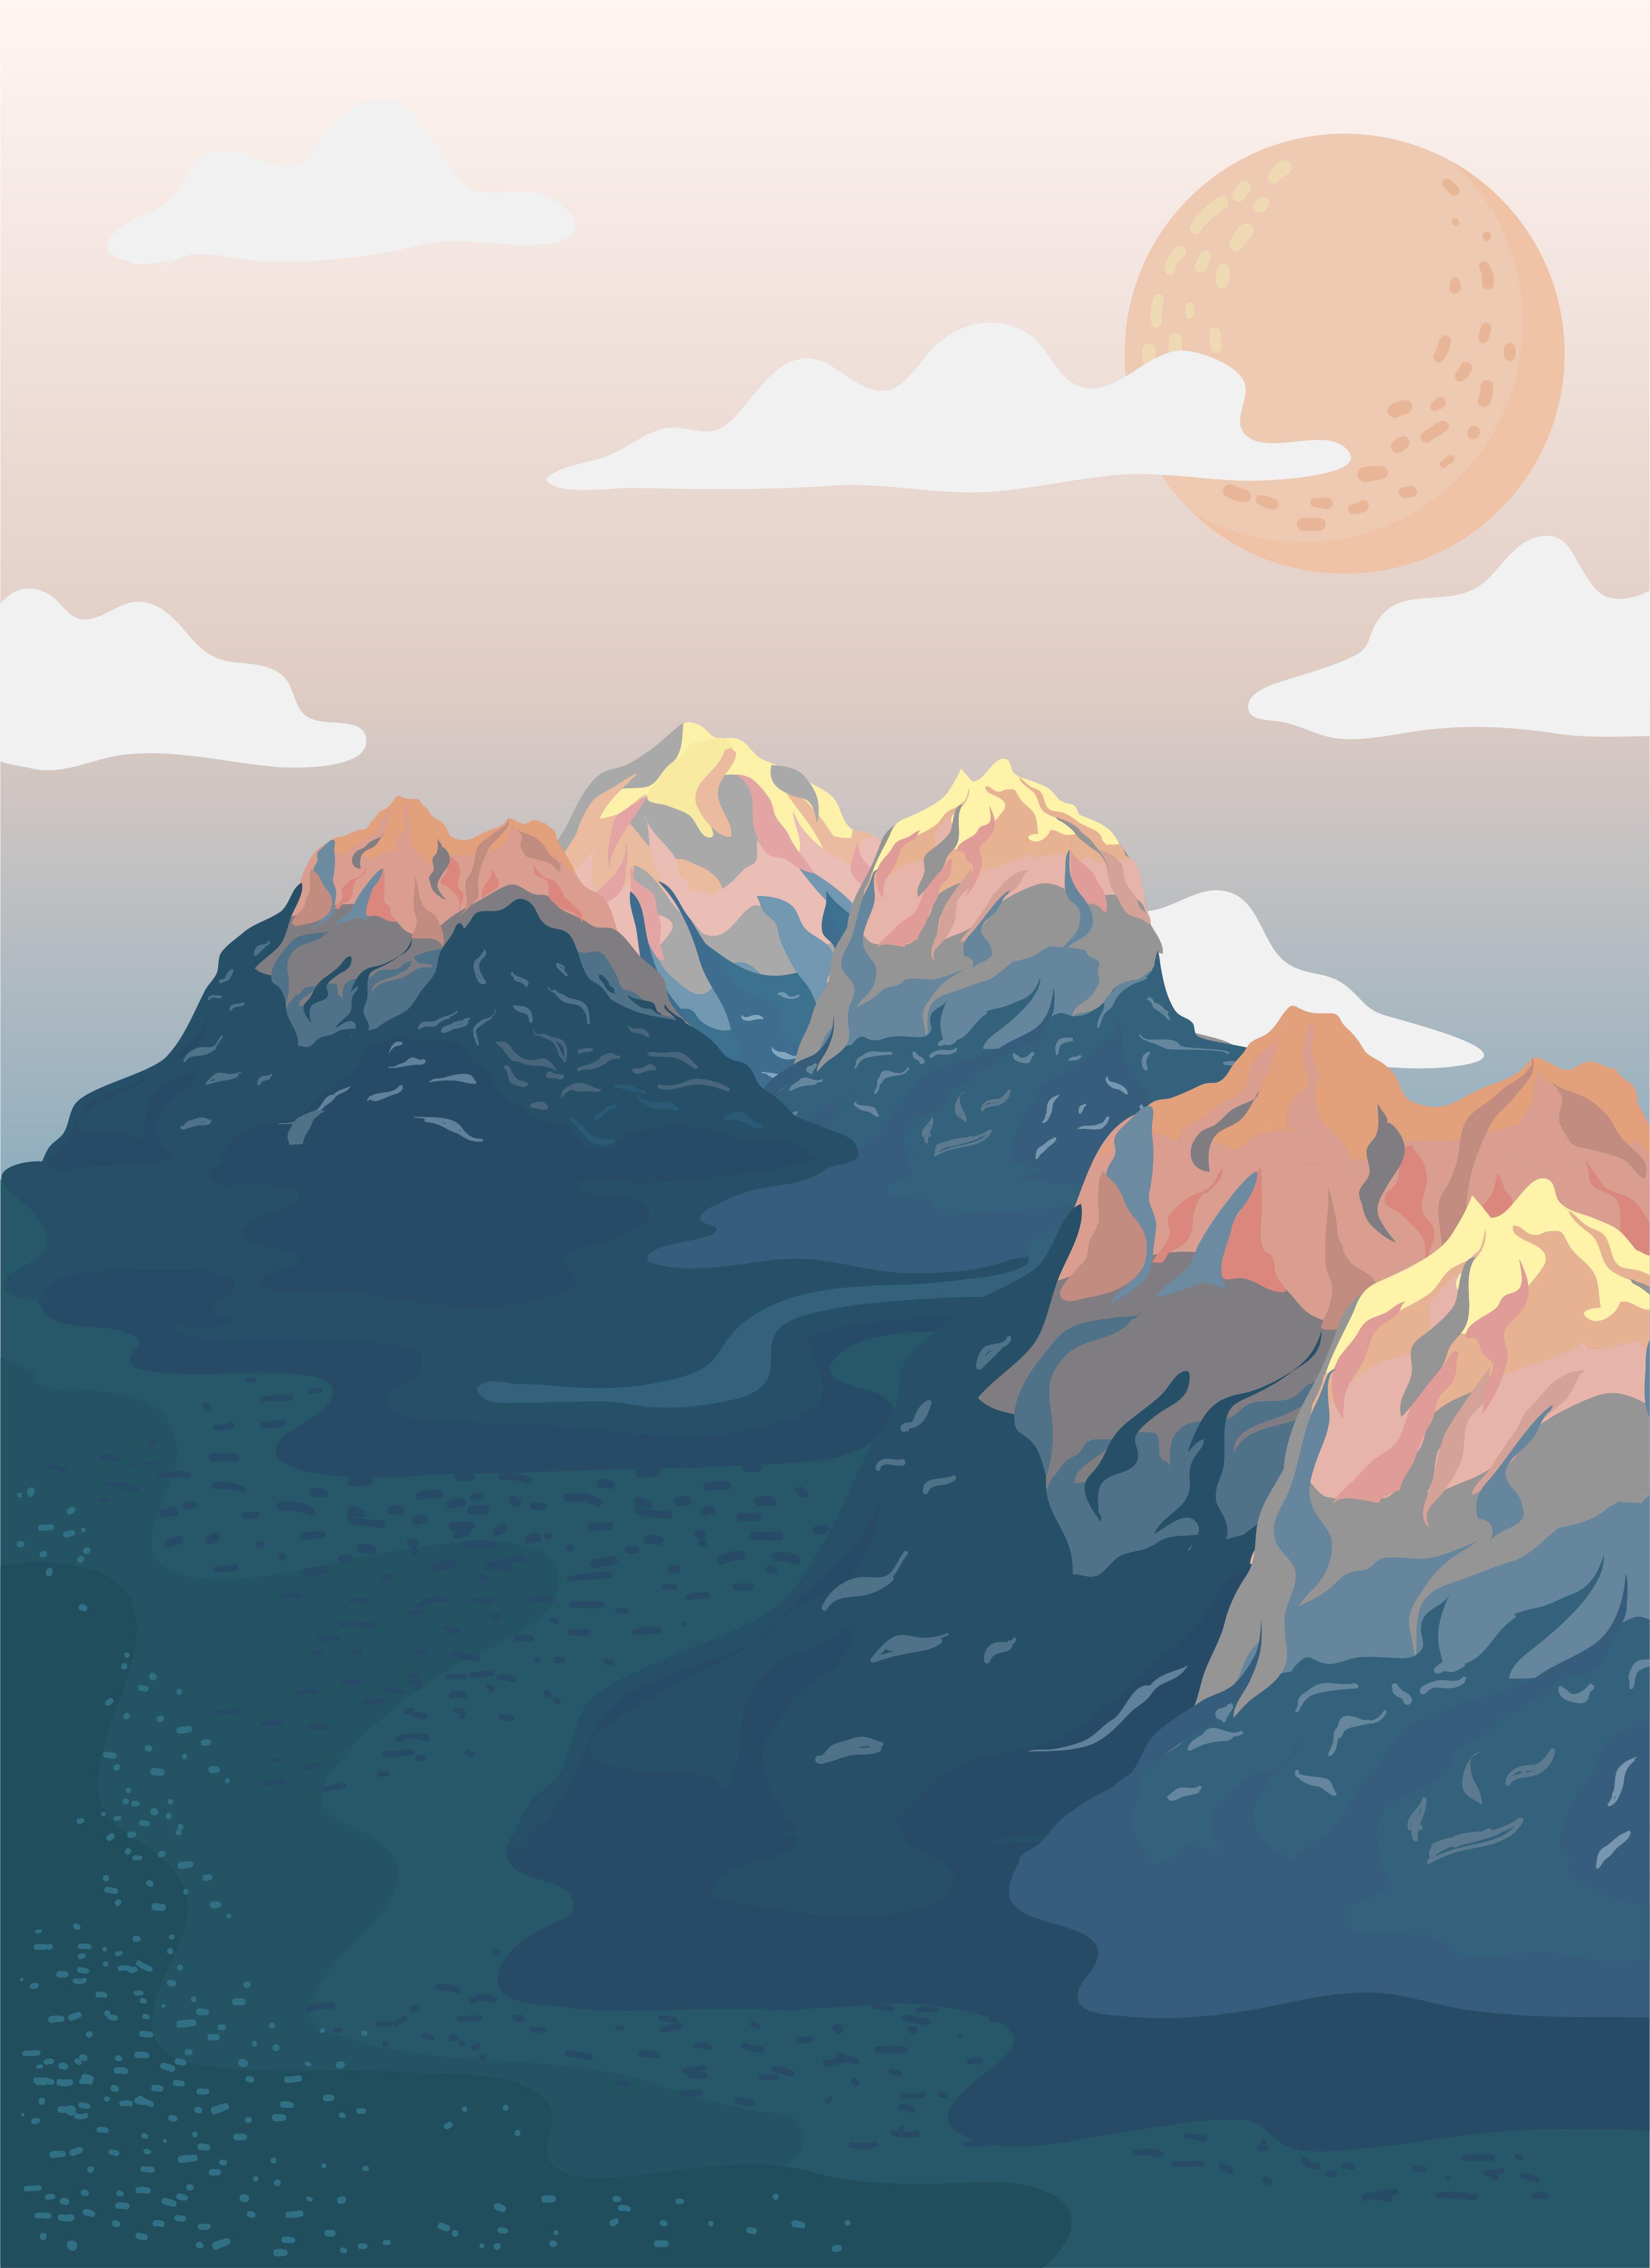 Painted Mountain View Landscape Illustration Download Free Vectors Clipart Graphics Amp Vector Art